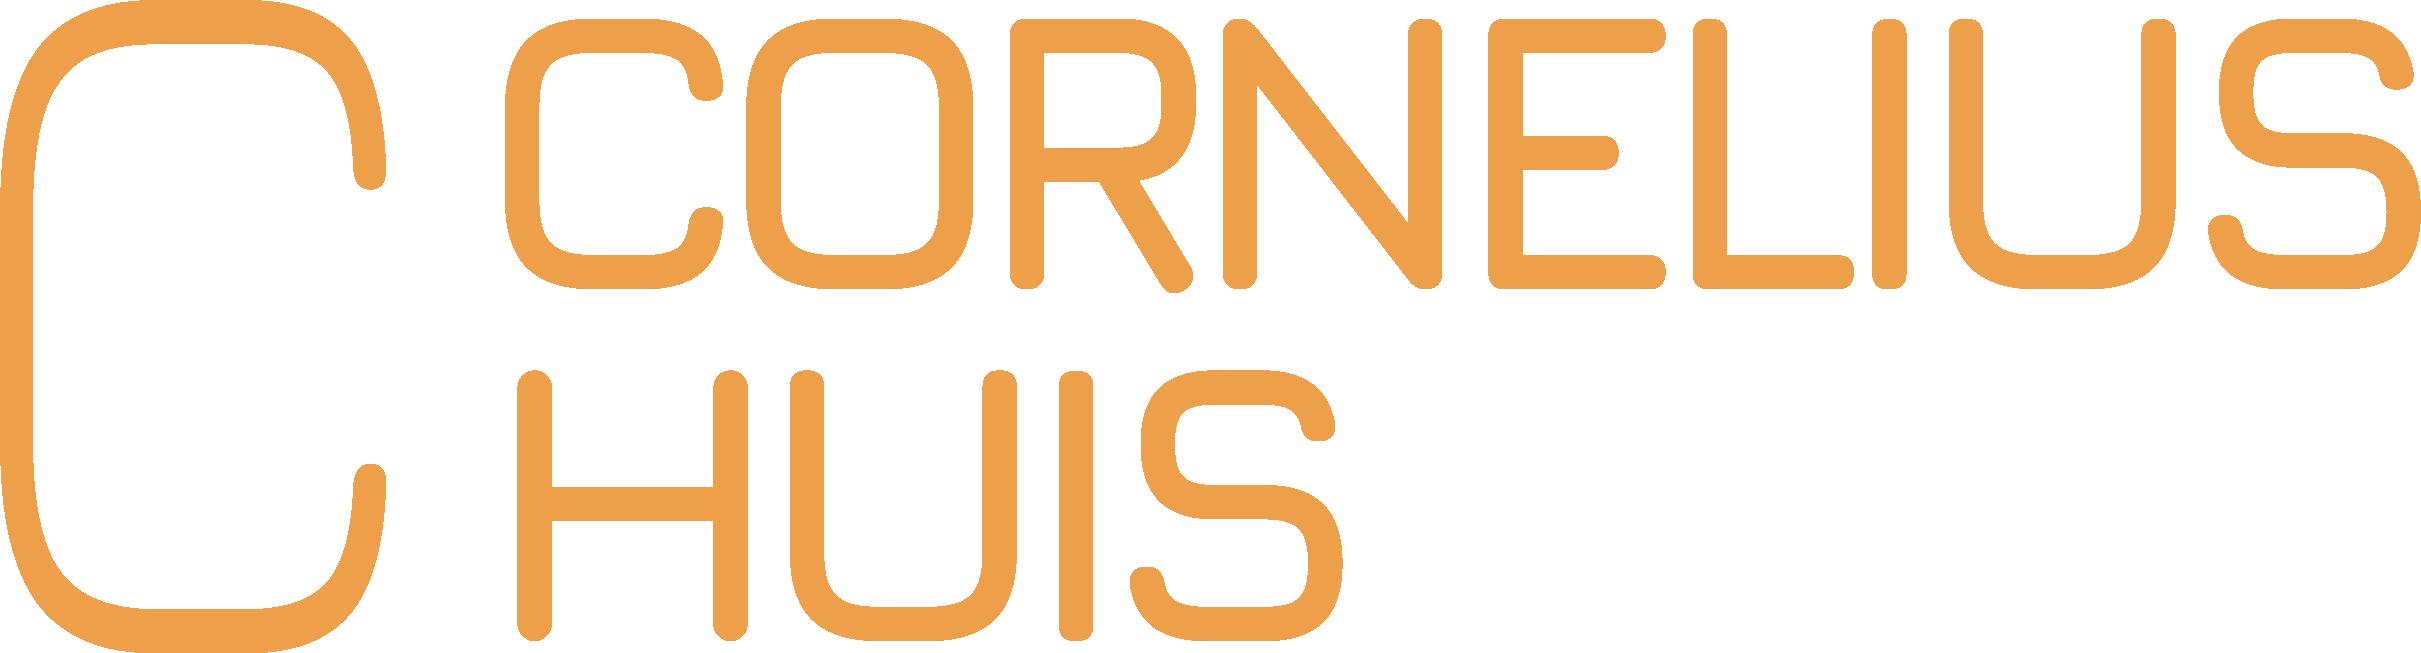 Corneliushuis.nl